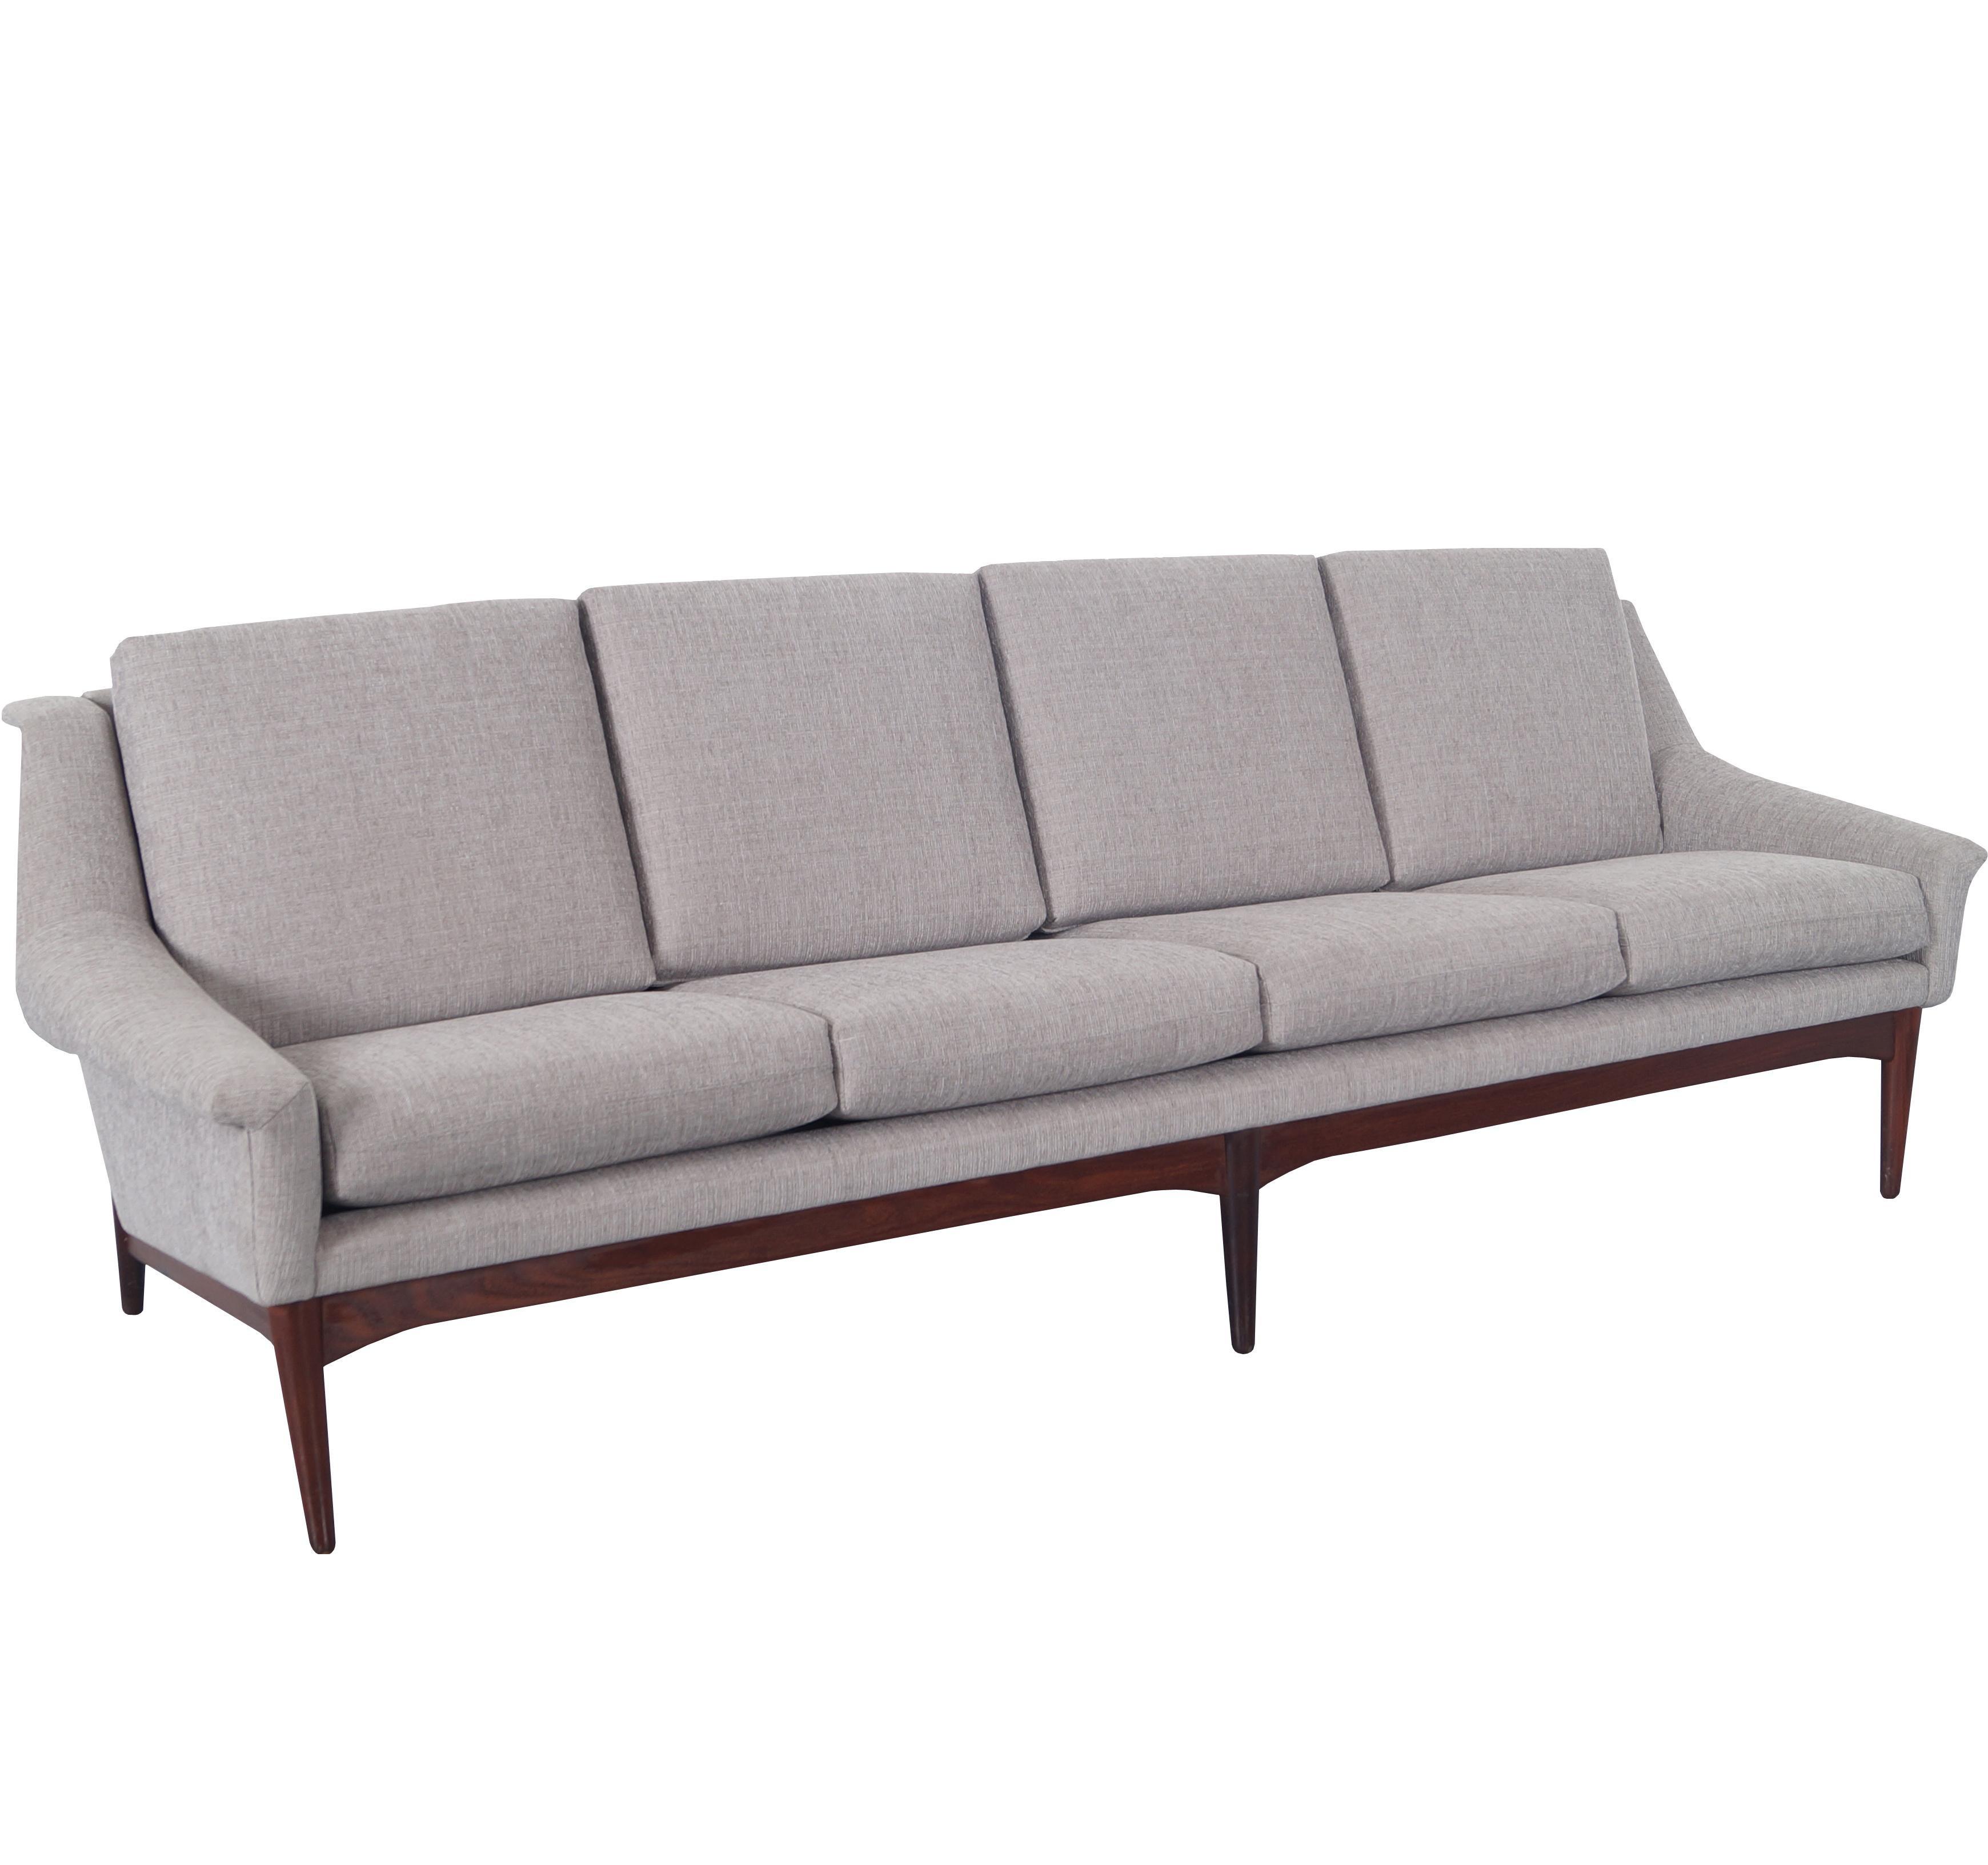 Exceptionnel Danish Modern Teak Sofa